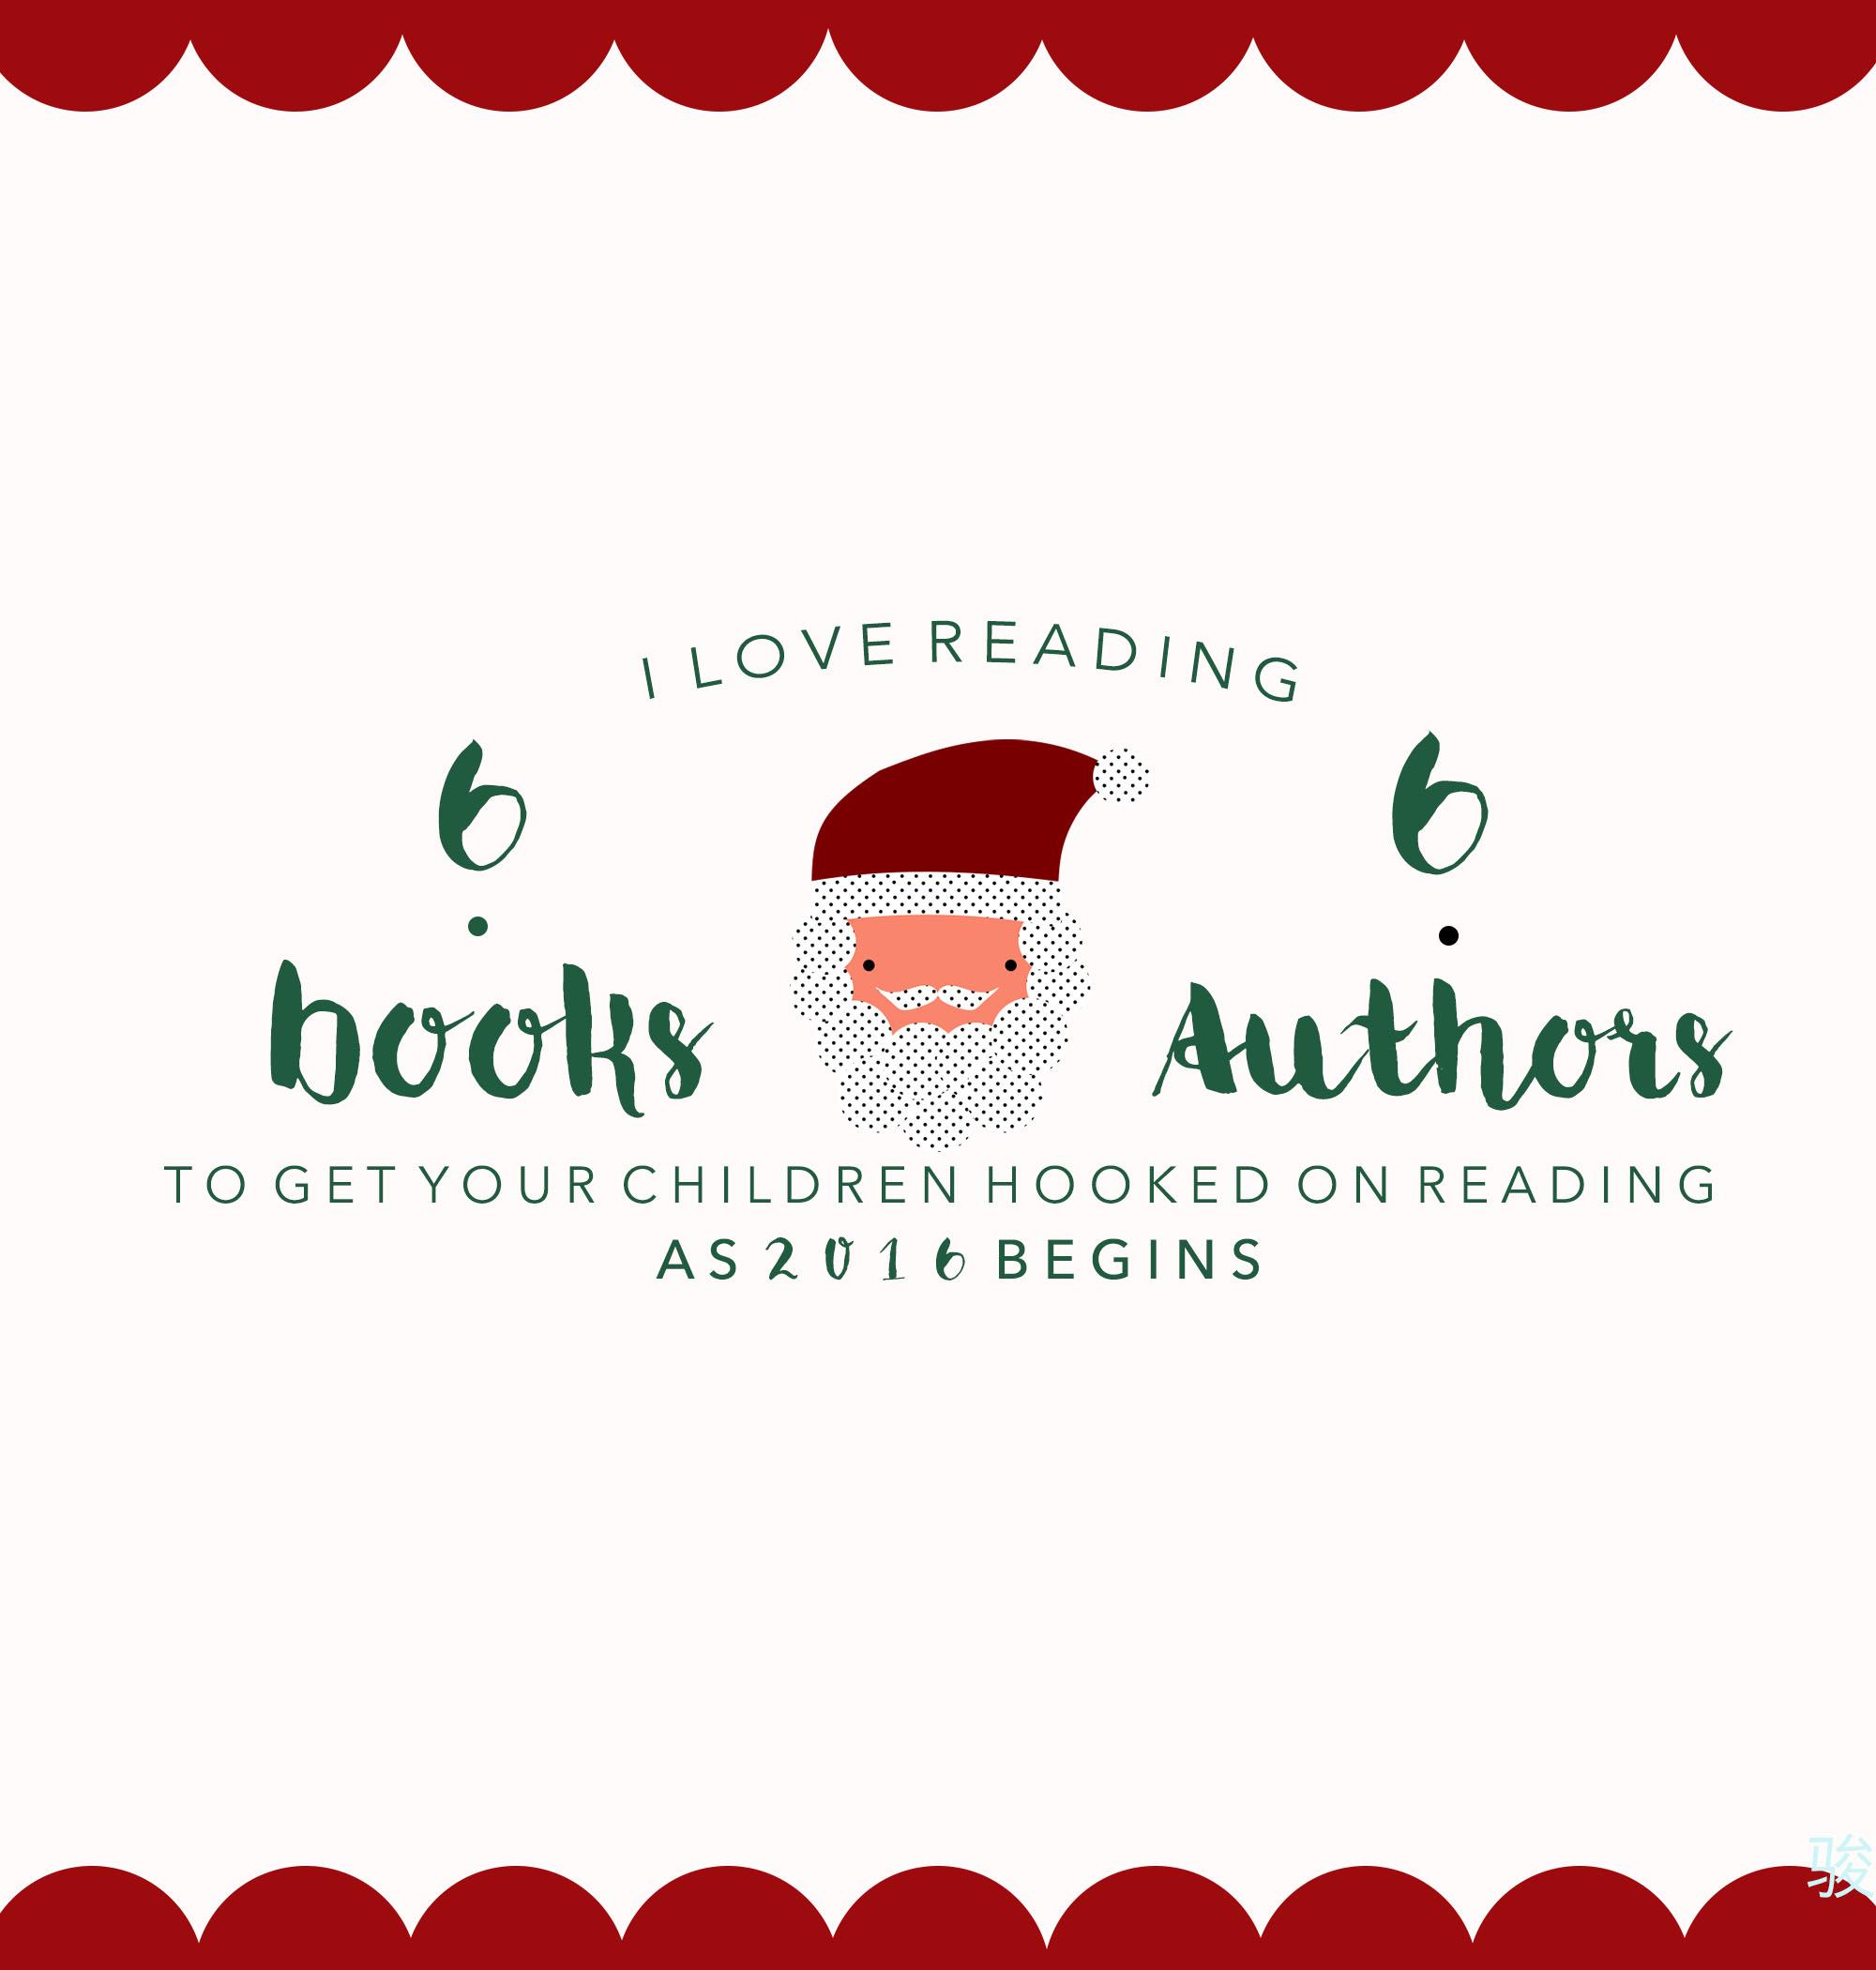 hooked on reading.jpg